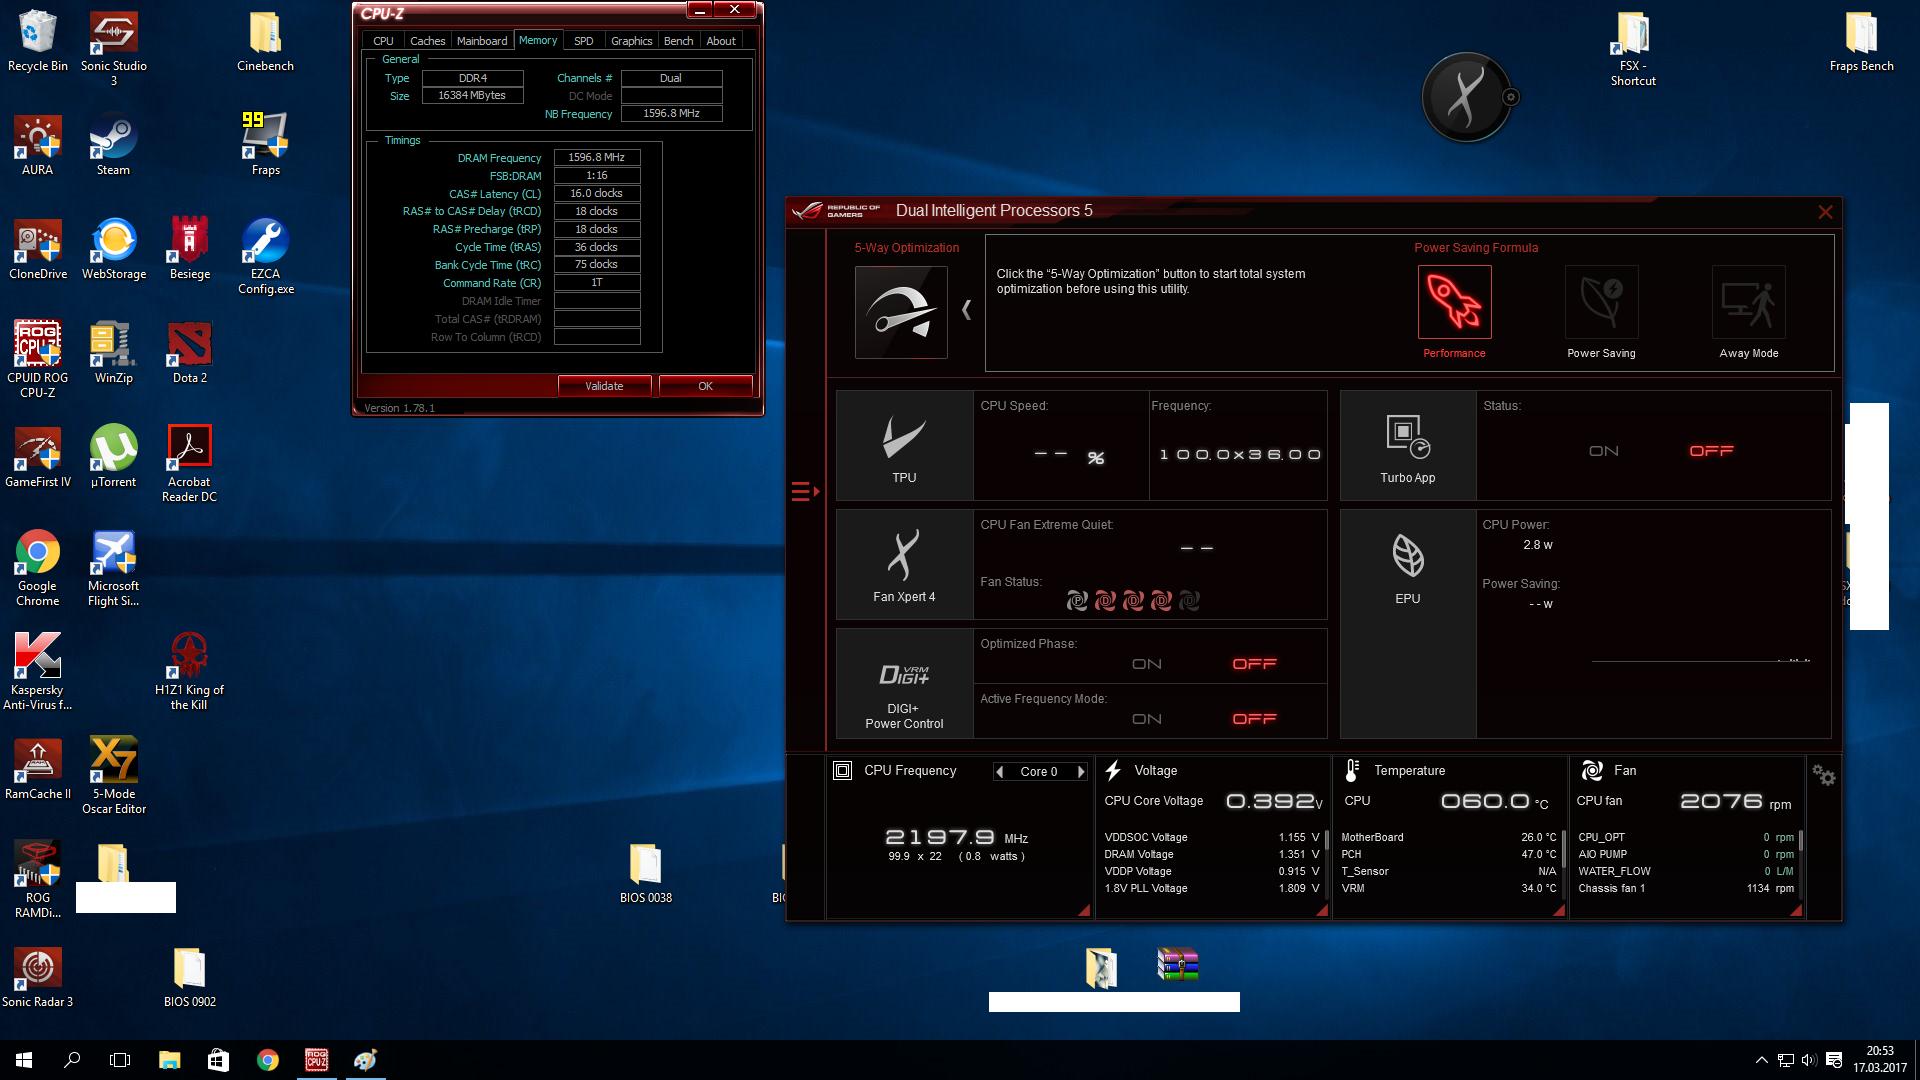 Crosshair VI Hero: UEFI build update thread